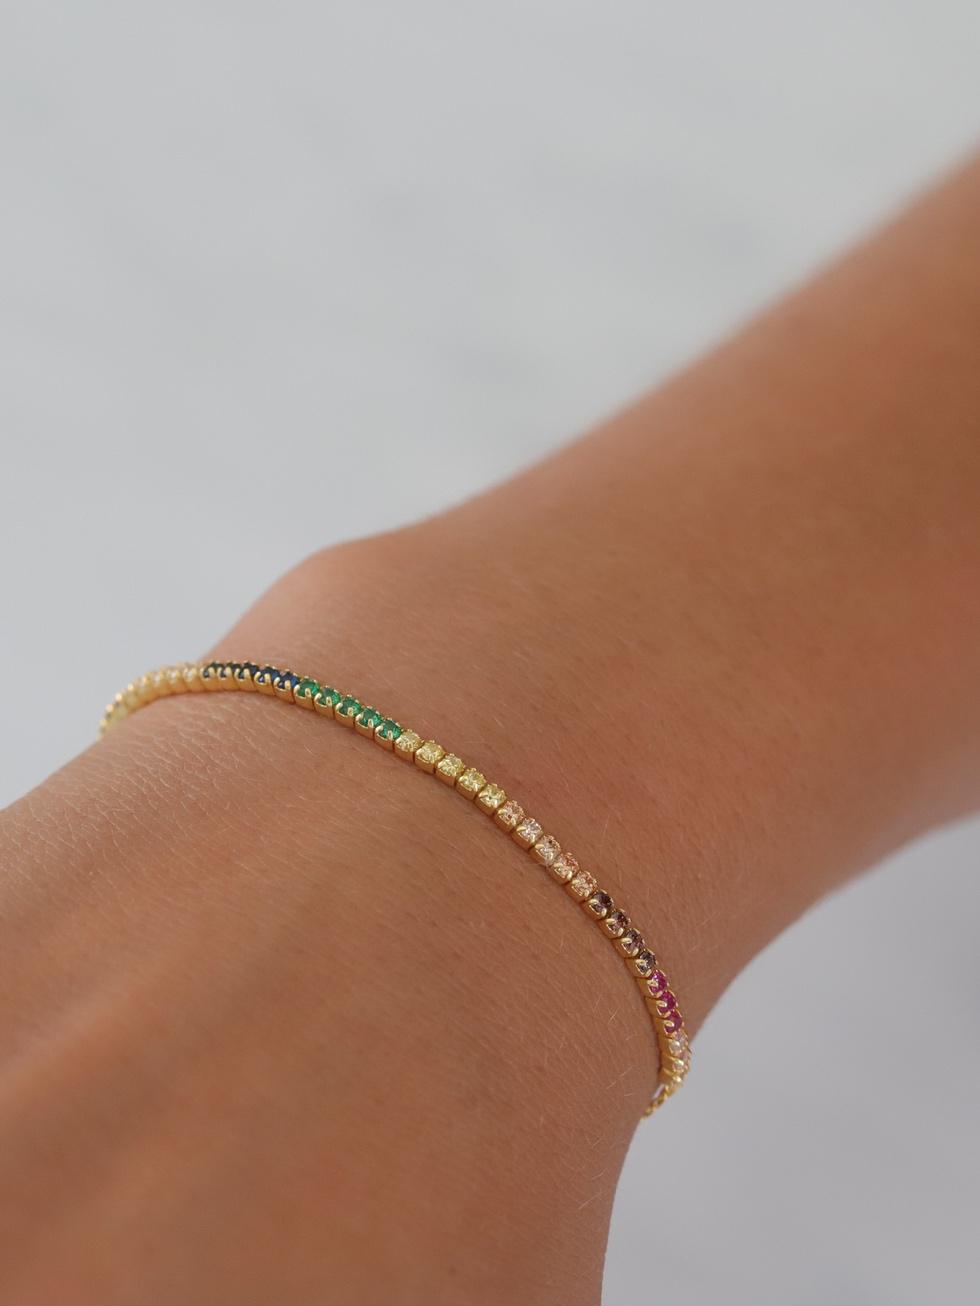 Bracelet rainbow gold mod2